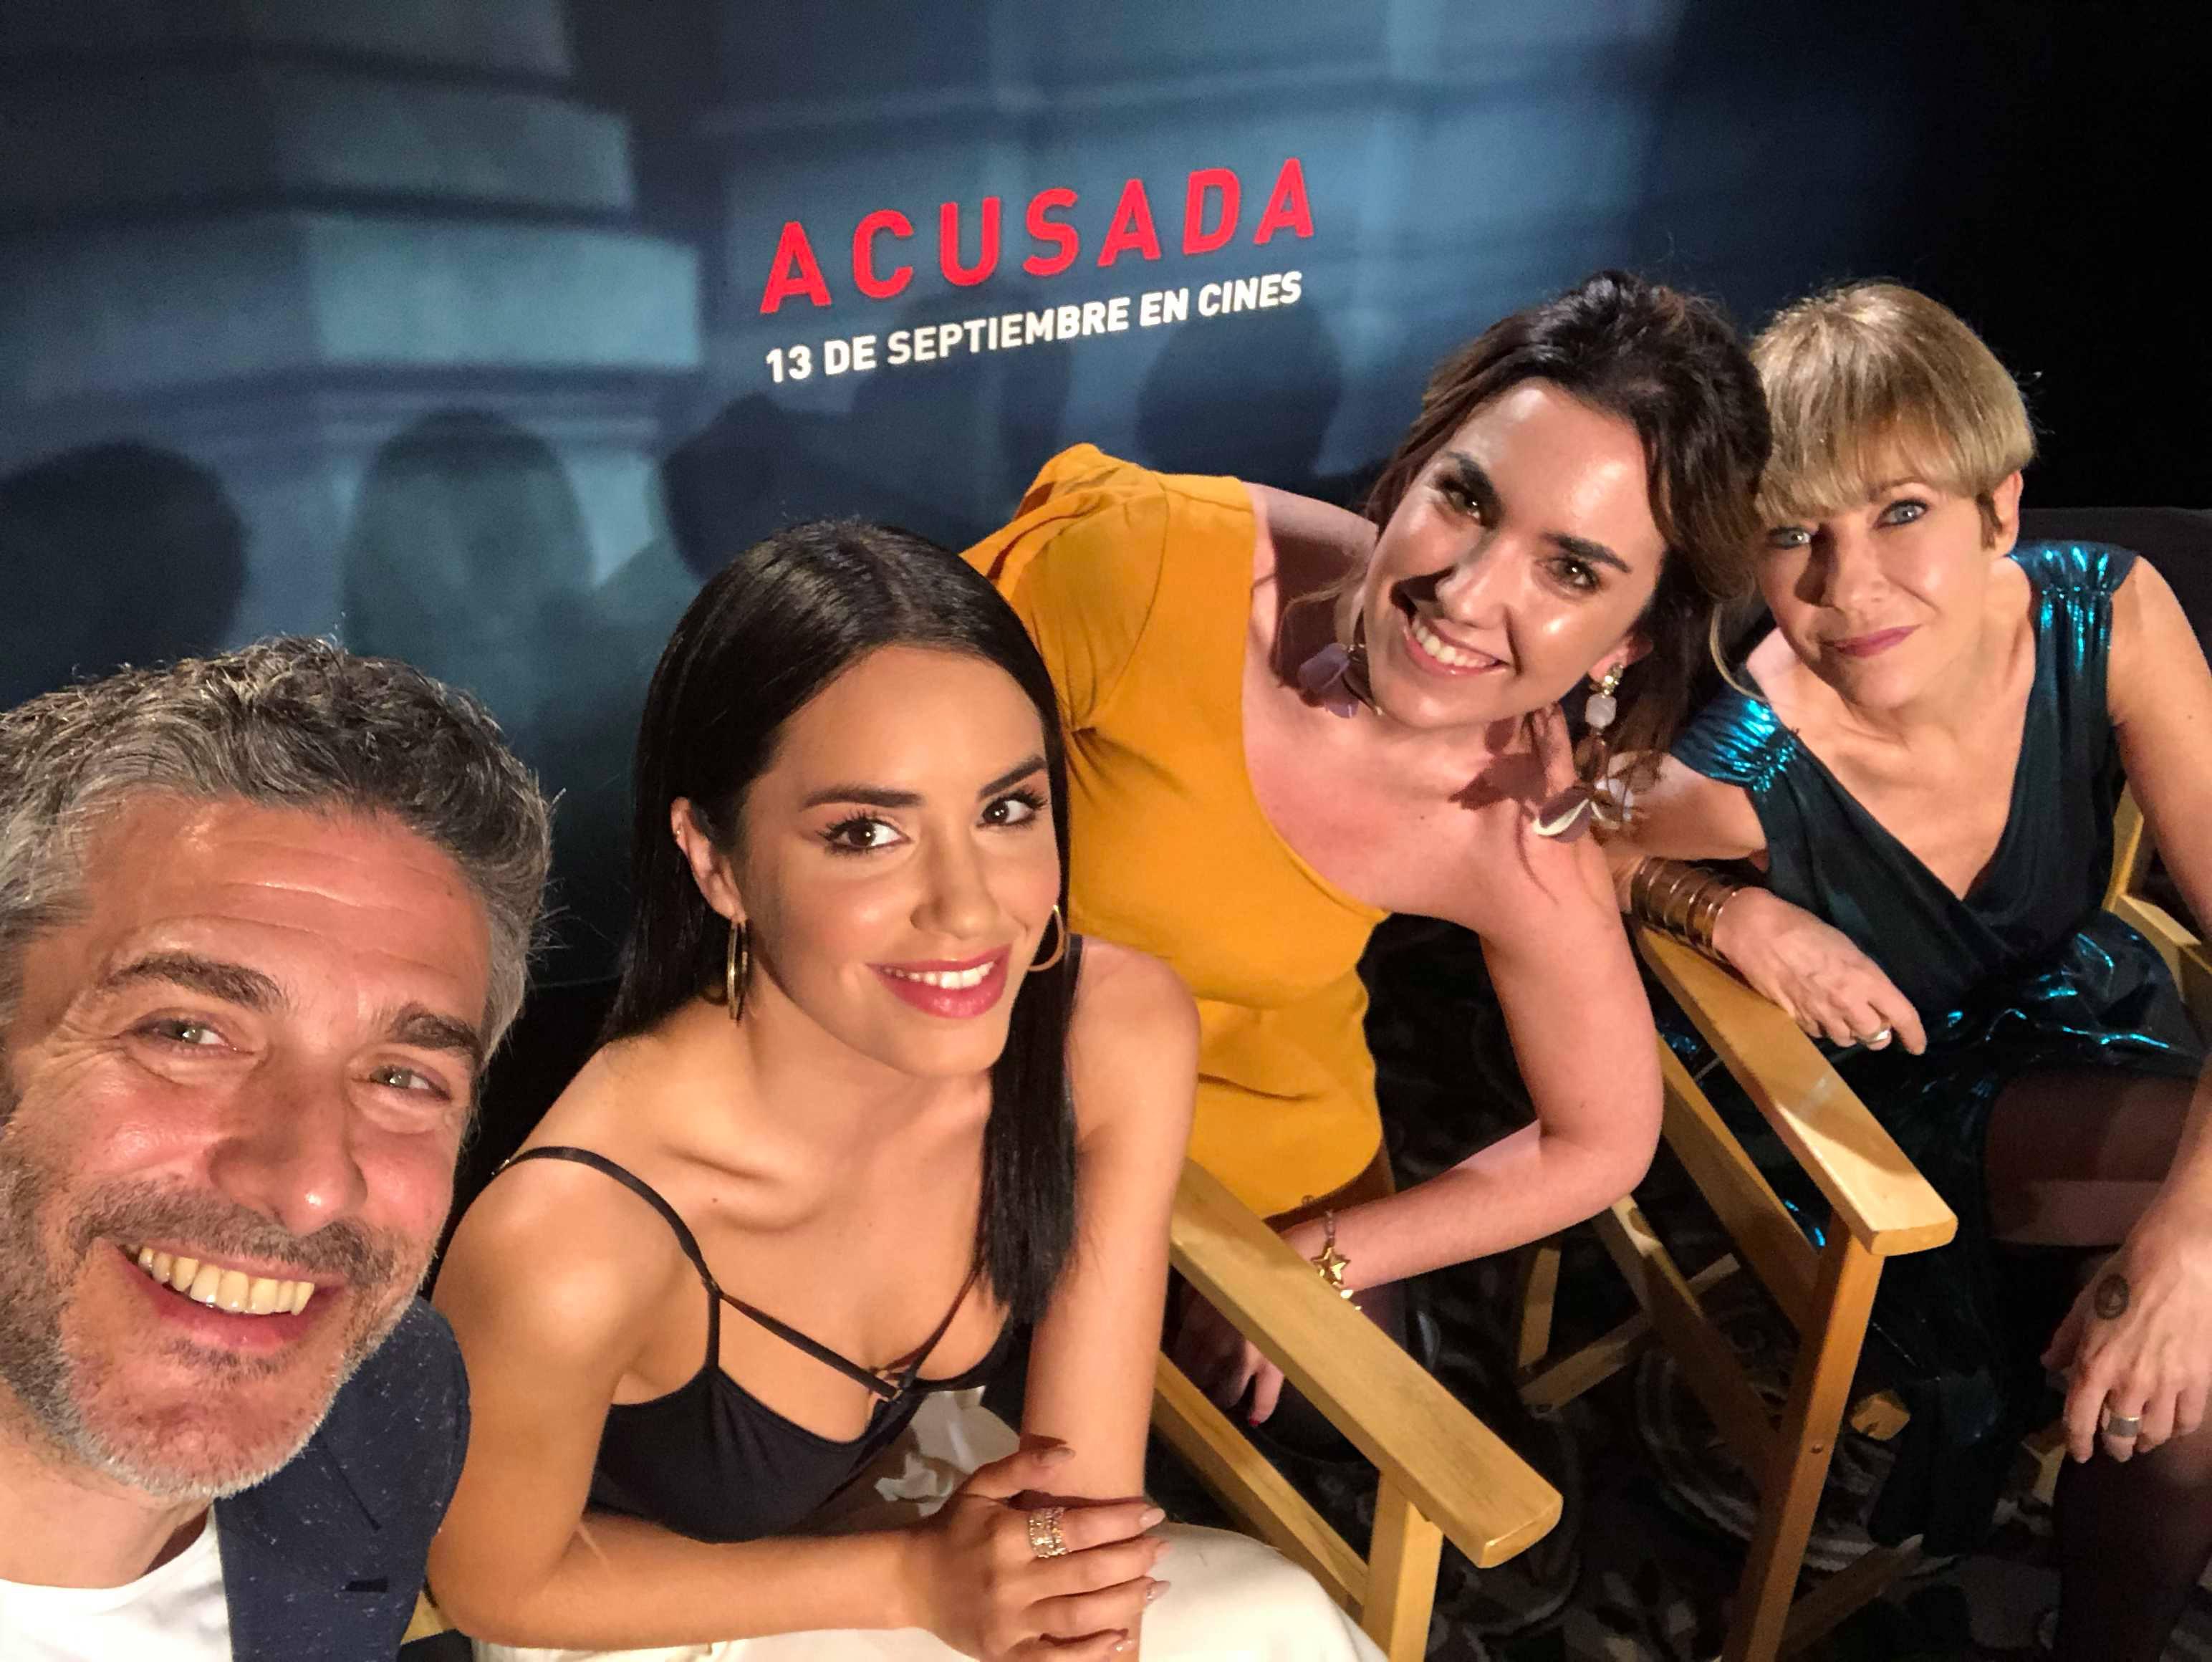 EXCLUSIVO: Lali Espósito, Leo Sbaraglia e Inés Estévez presentan ACUSADA